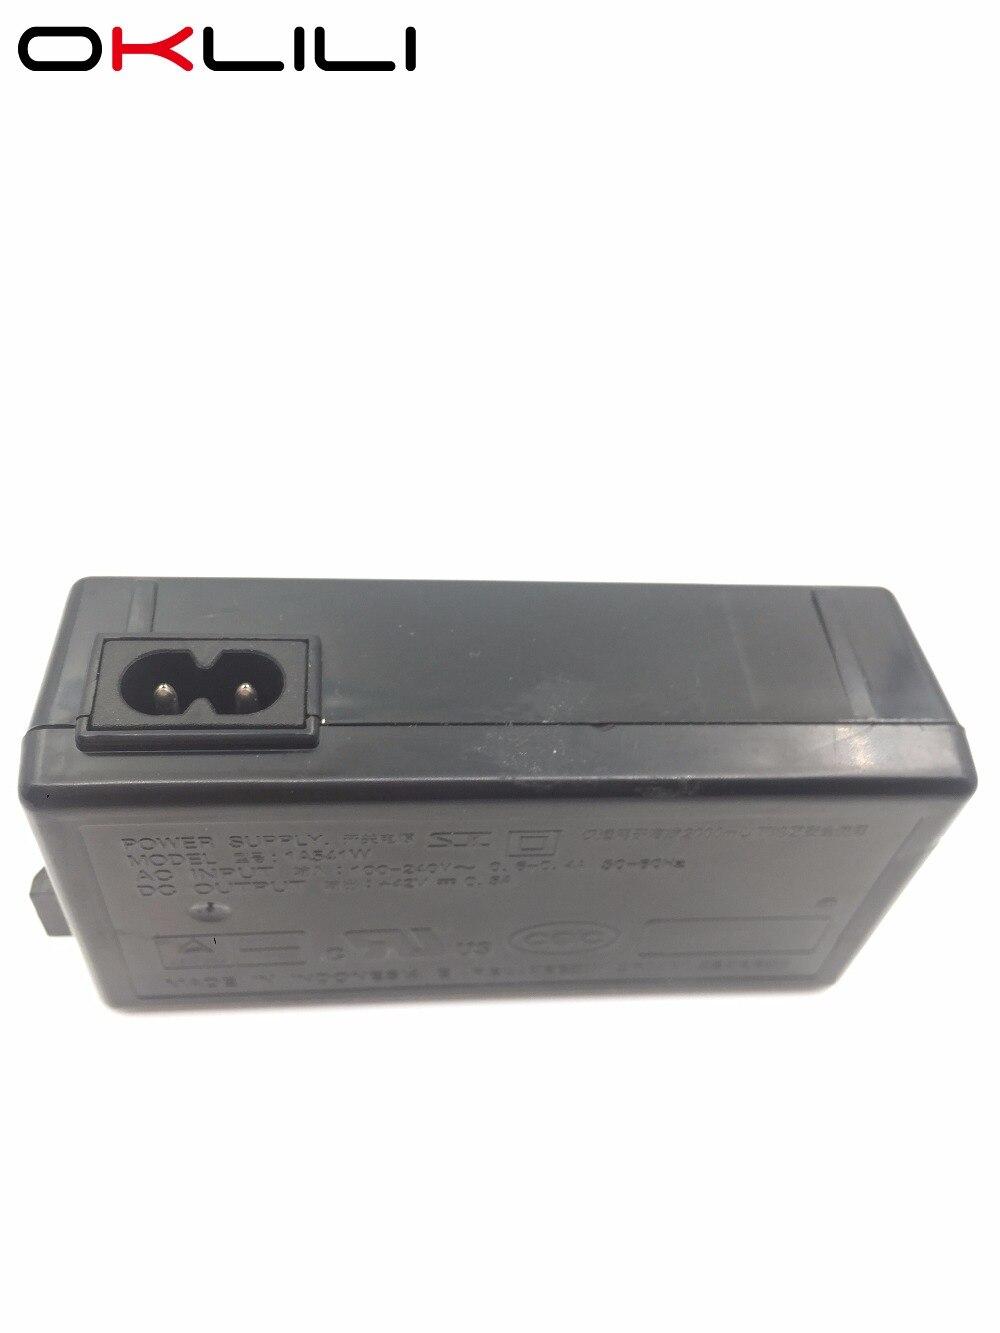 Adaptor Power Supply L210 L220 L550 L555 L565 Update Harga Terkini Asf Karet Roller Penarik Kertas Epson L110 L120 L300 L310 L350 L355 L360 L365 L455 New Original Ac Adapter Charger For